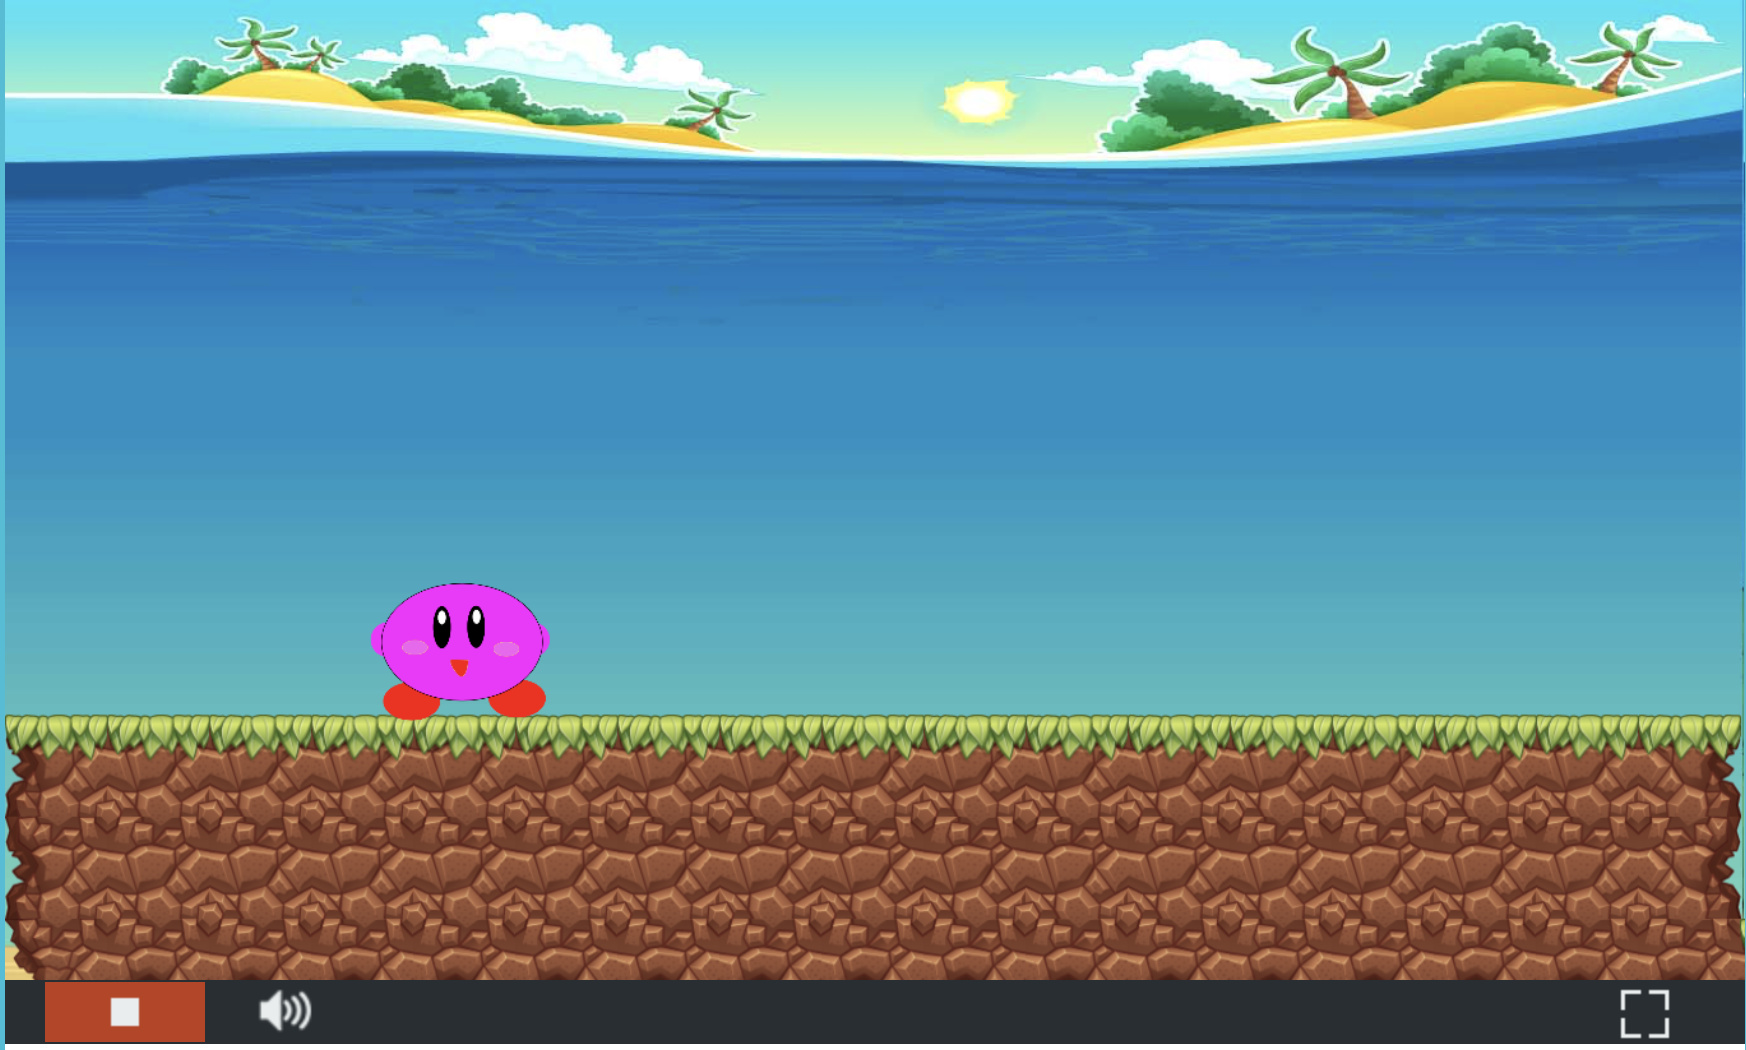 DC-Kirbys-World-George-Mohamed